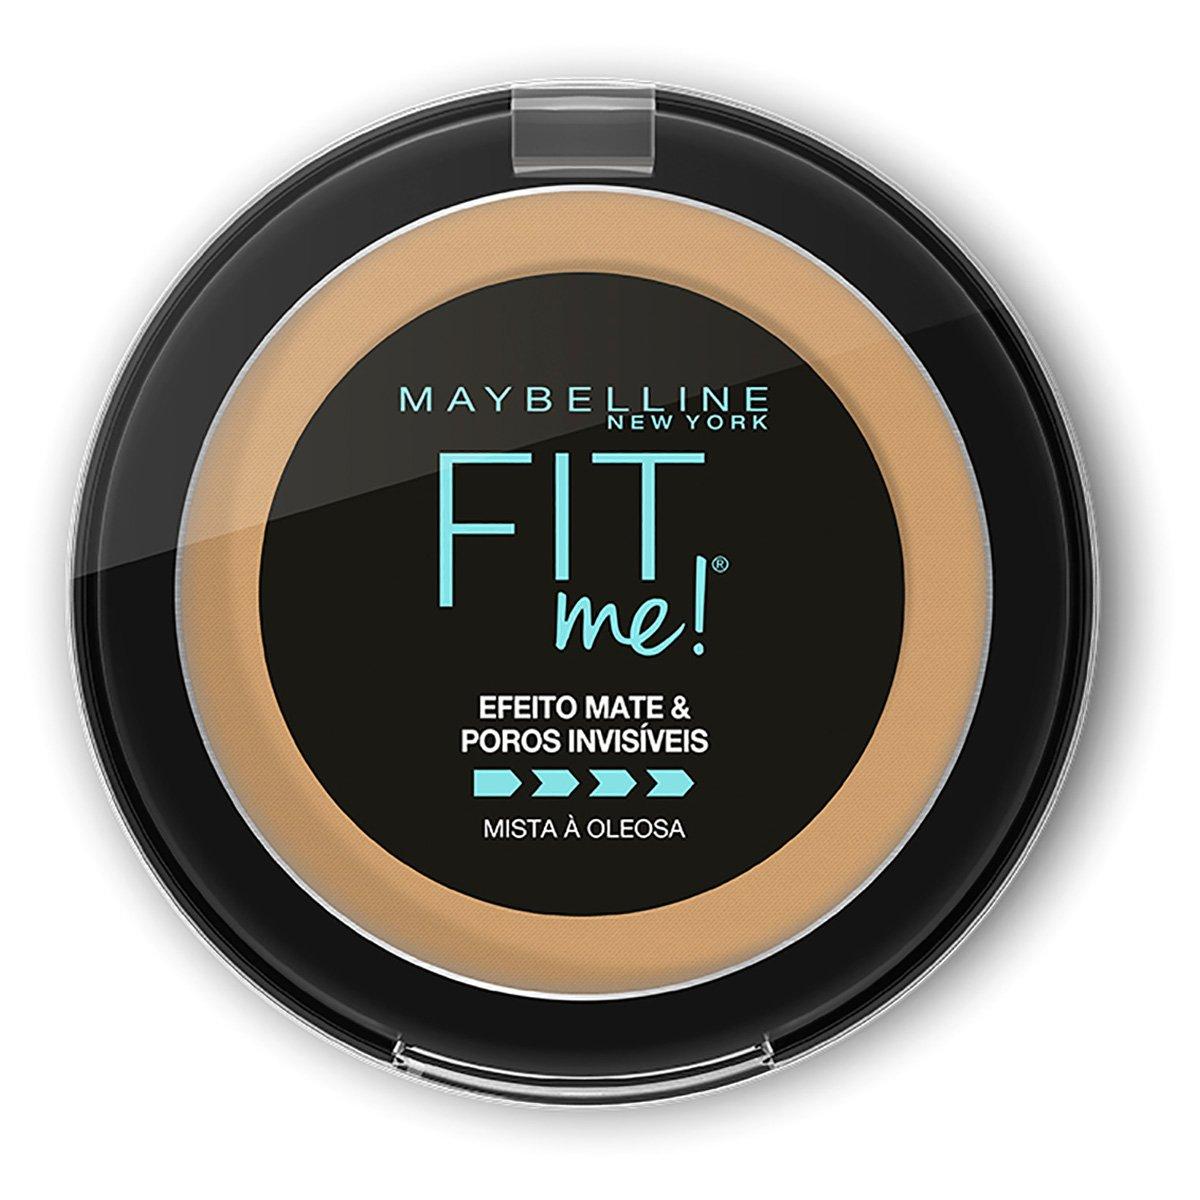 Pó compacto Maybelline Fit Me B07 Médio Escuro Bege